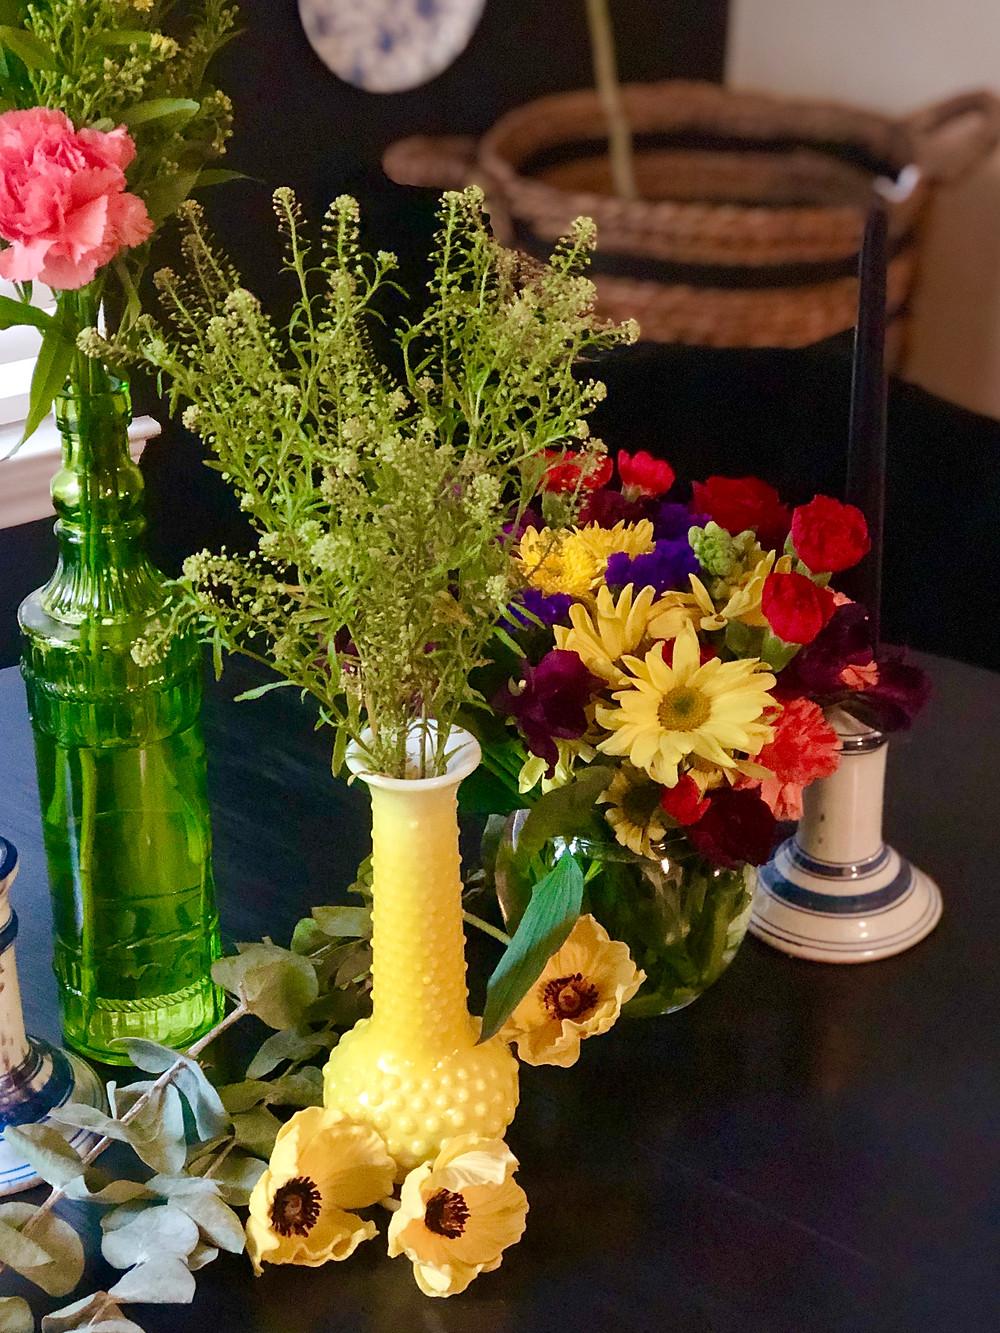 Tea Reviews: Green Hot Cinnamon Spice | Harney & Sons